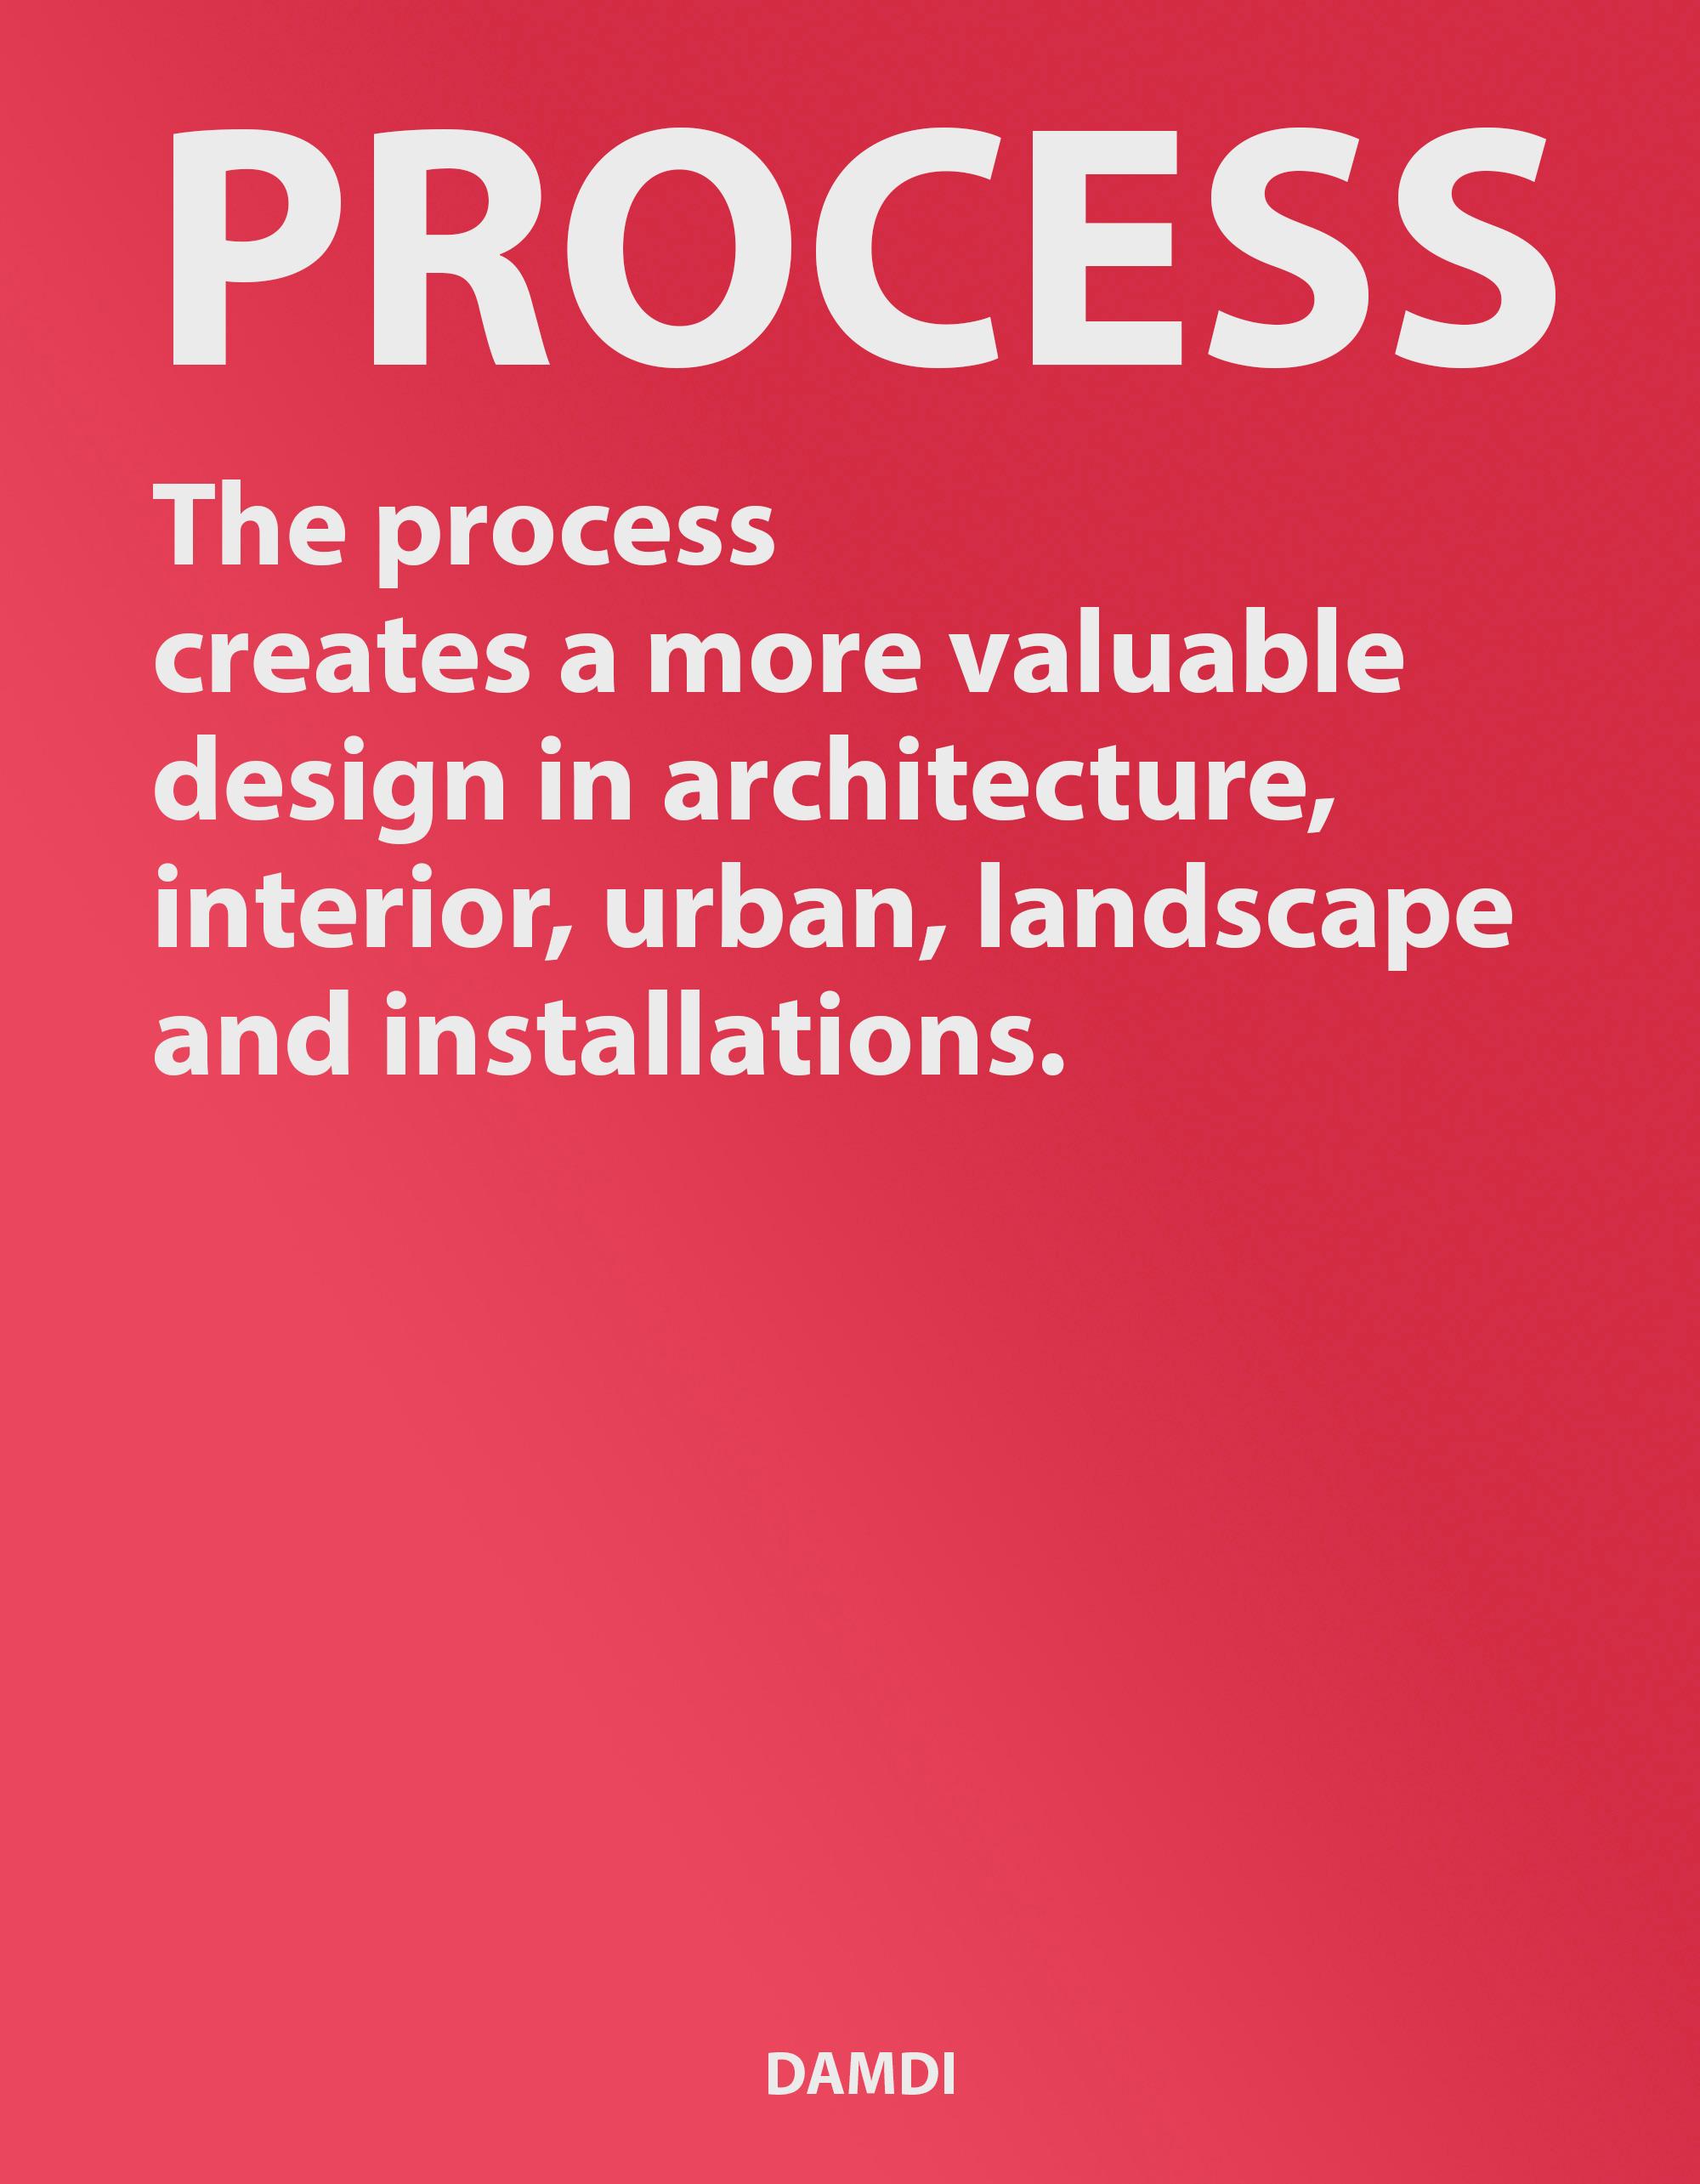 process, The process creates a more valuable design...